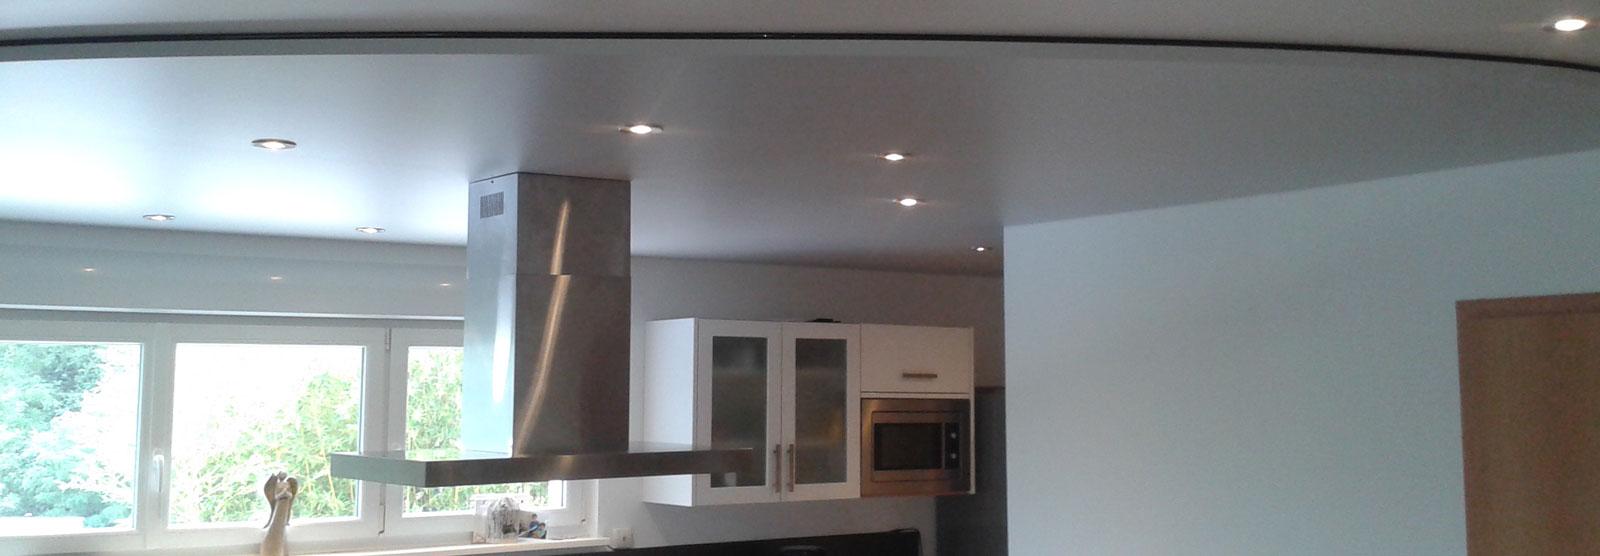 plafond tendu lm vente et installation de plafonds. Black Bedroom Furniture Sets. Home Design Ideas